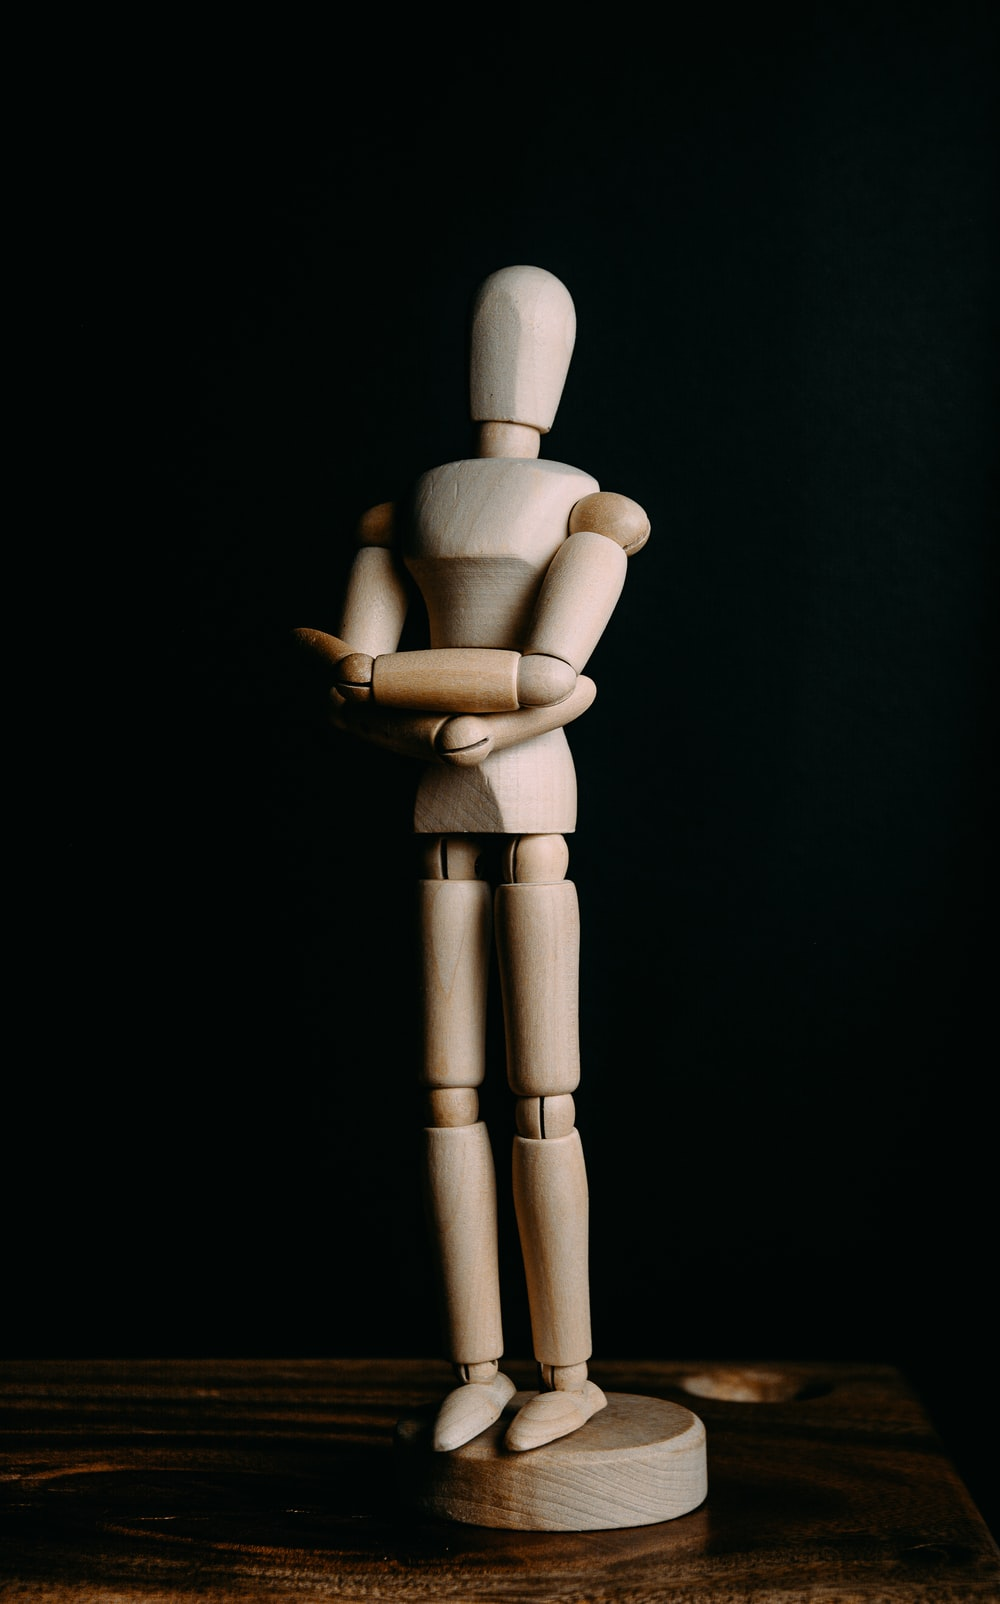 brown wooden human form figurine